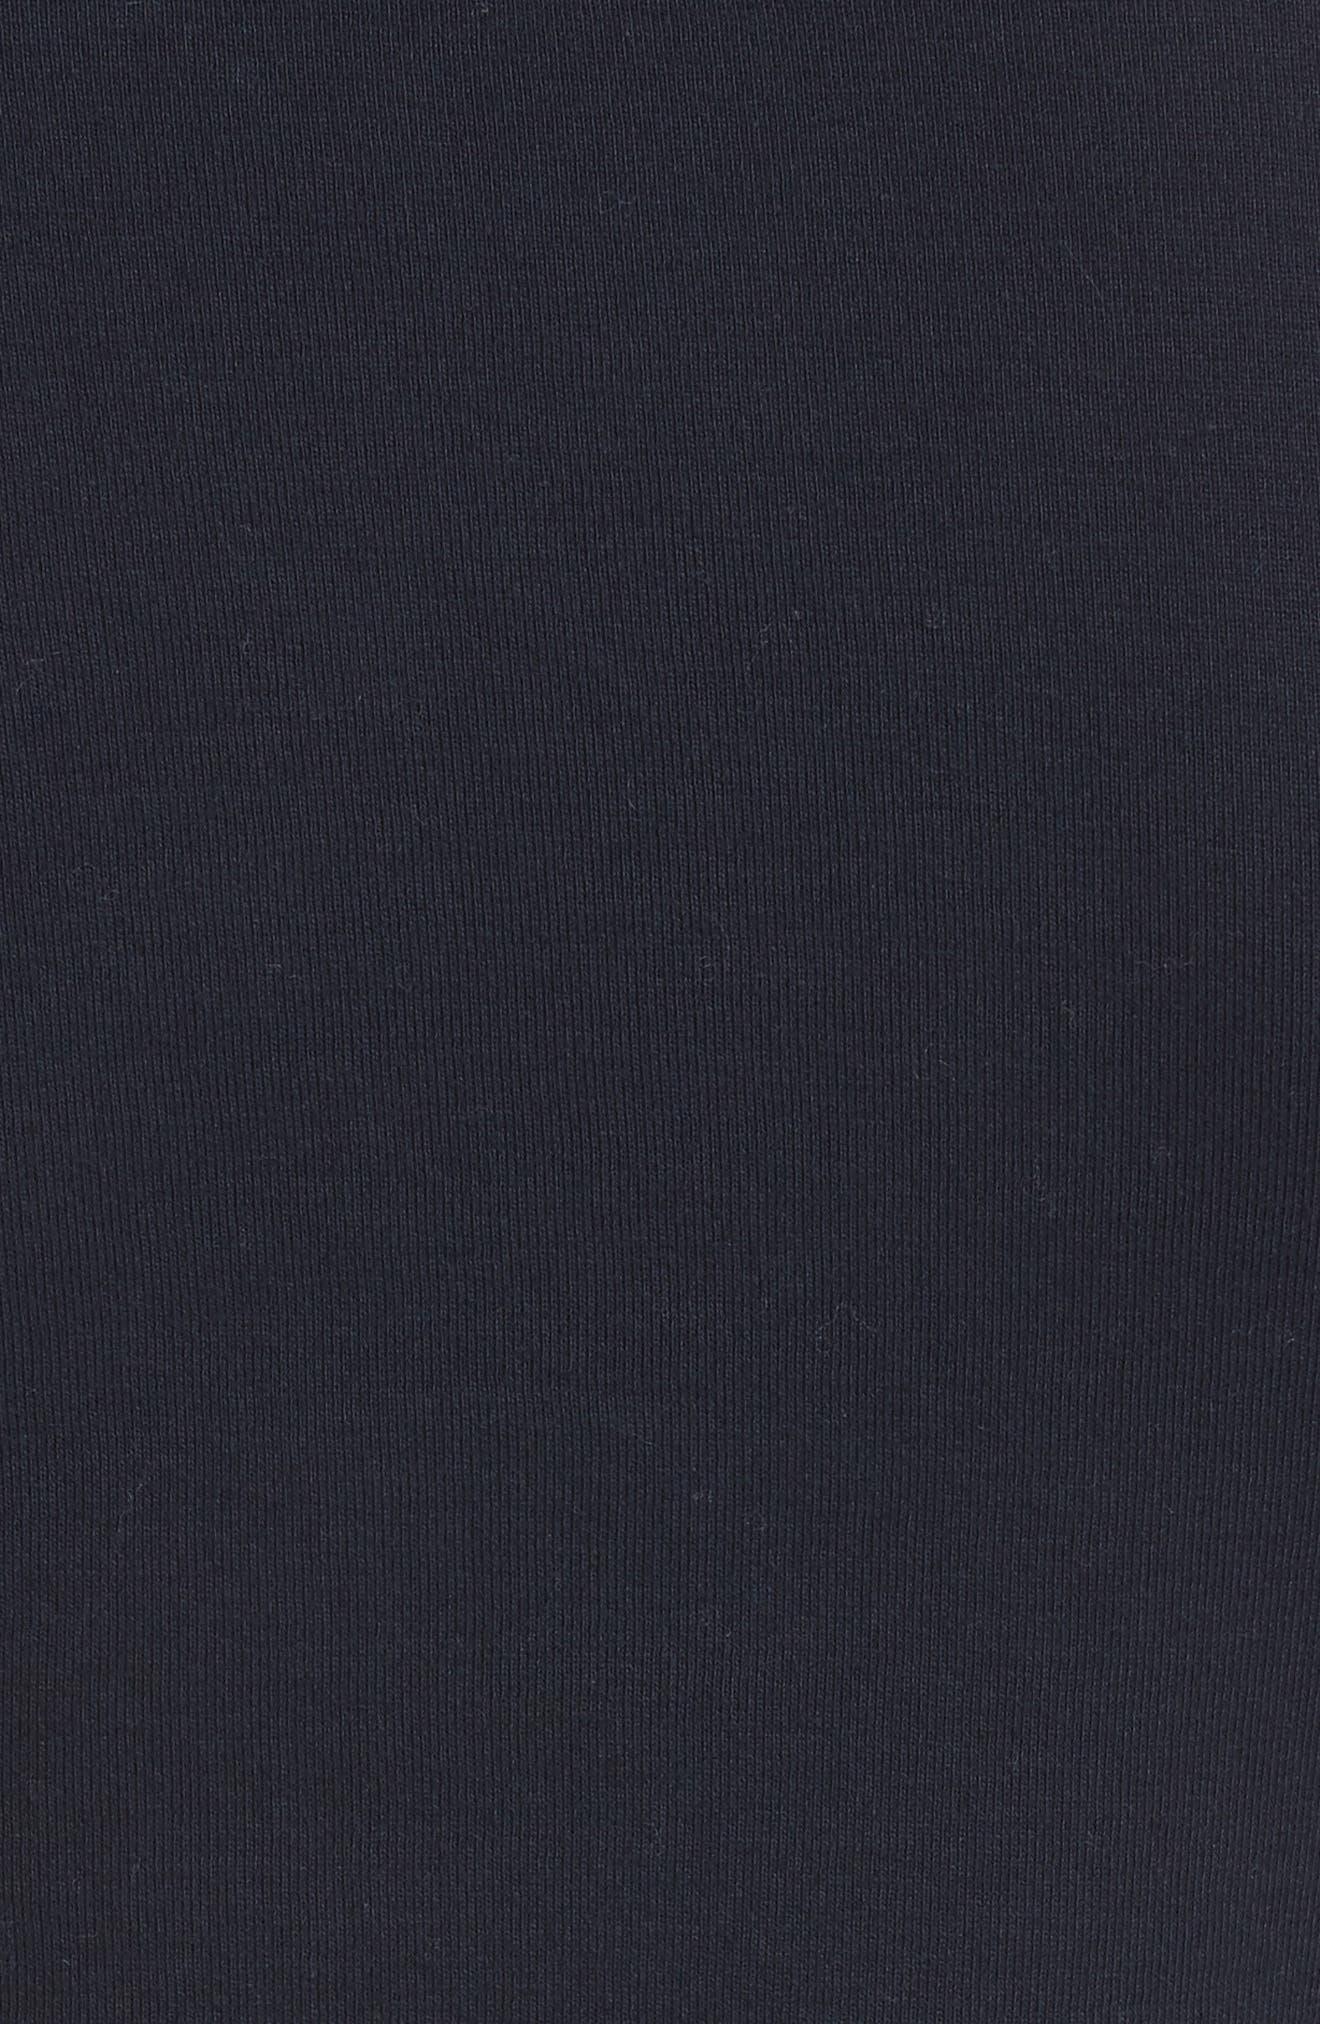 Dahlia Dot Sleeve Top,                             Alternate thumbnail 5, color,                             Midnight Navy